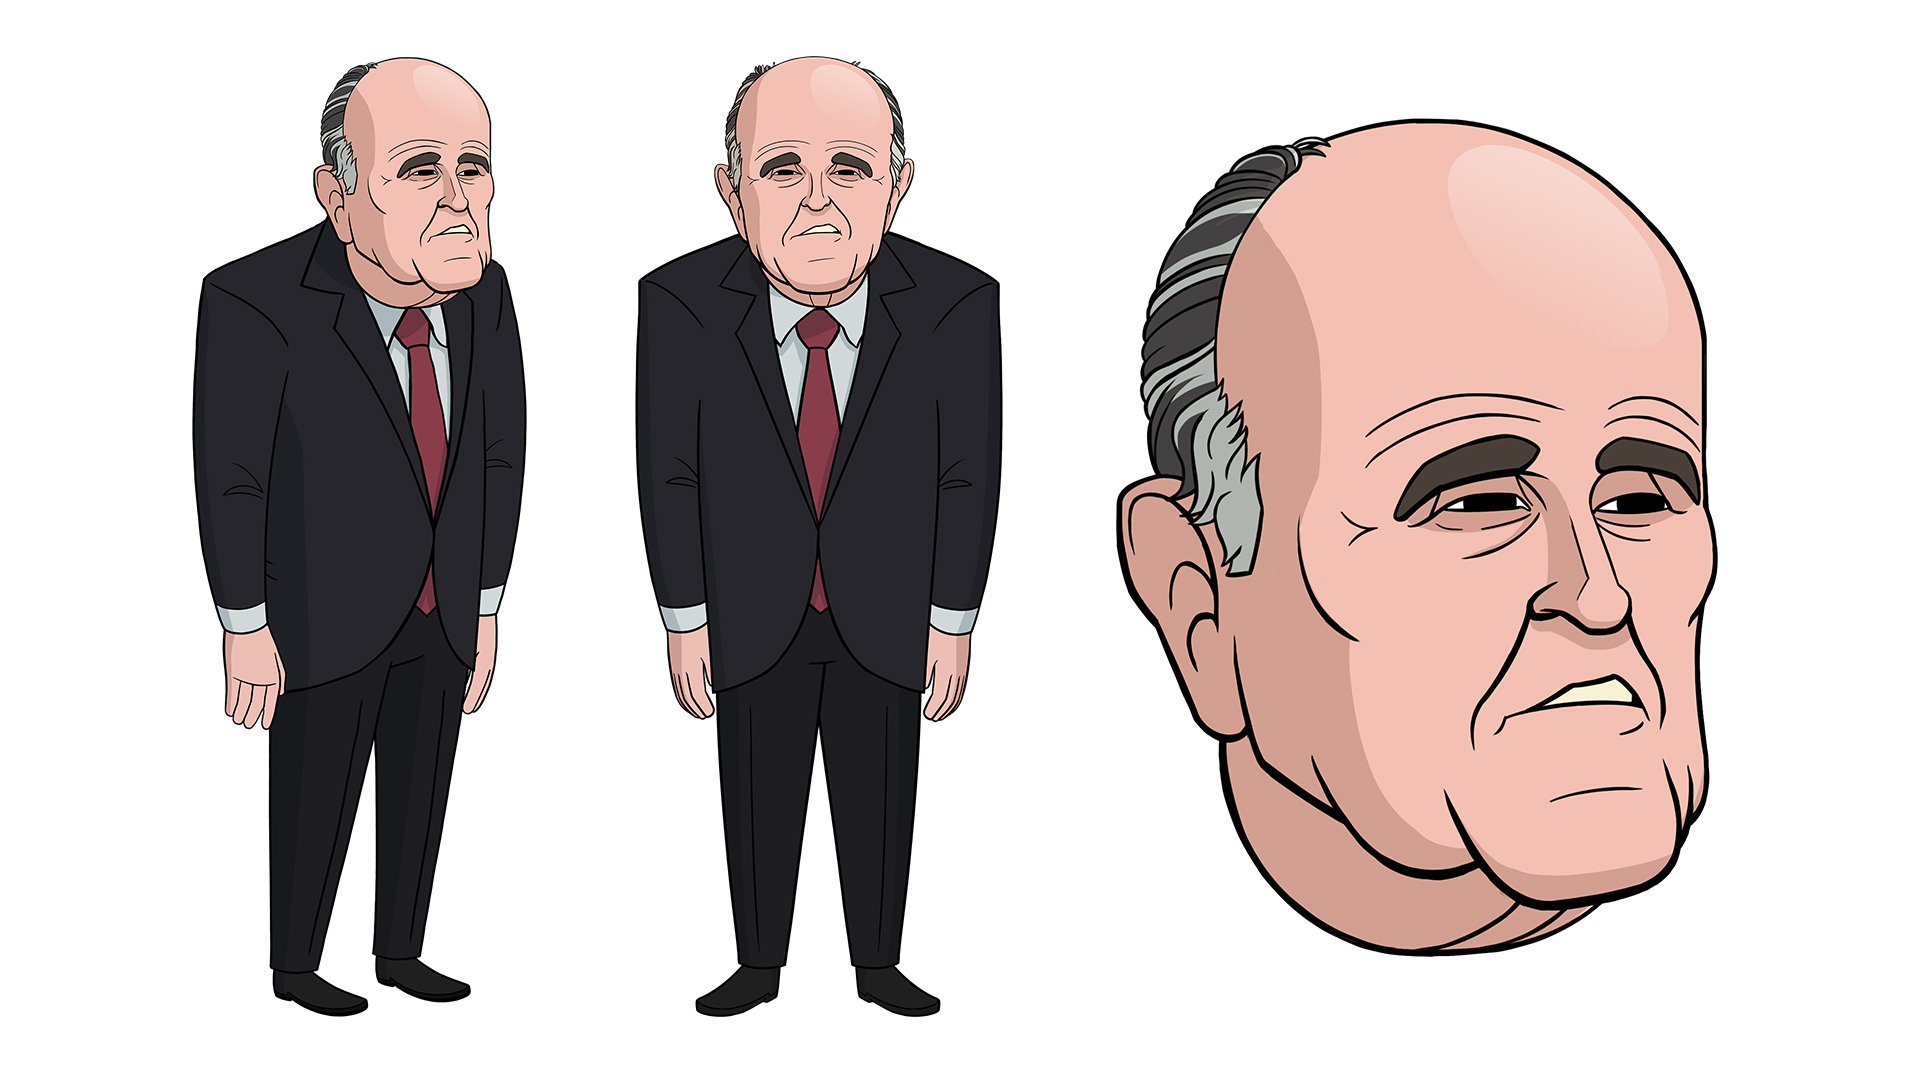 06_Giuliani_01.jpg